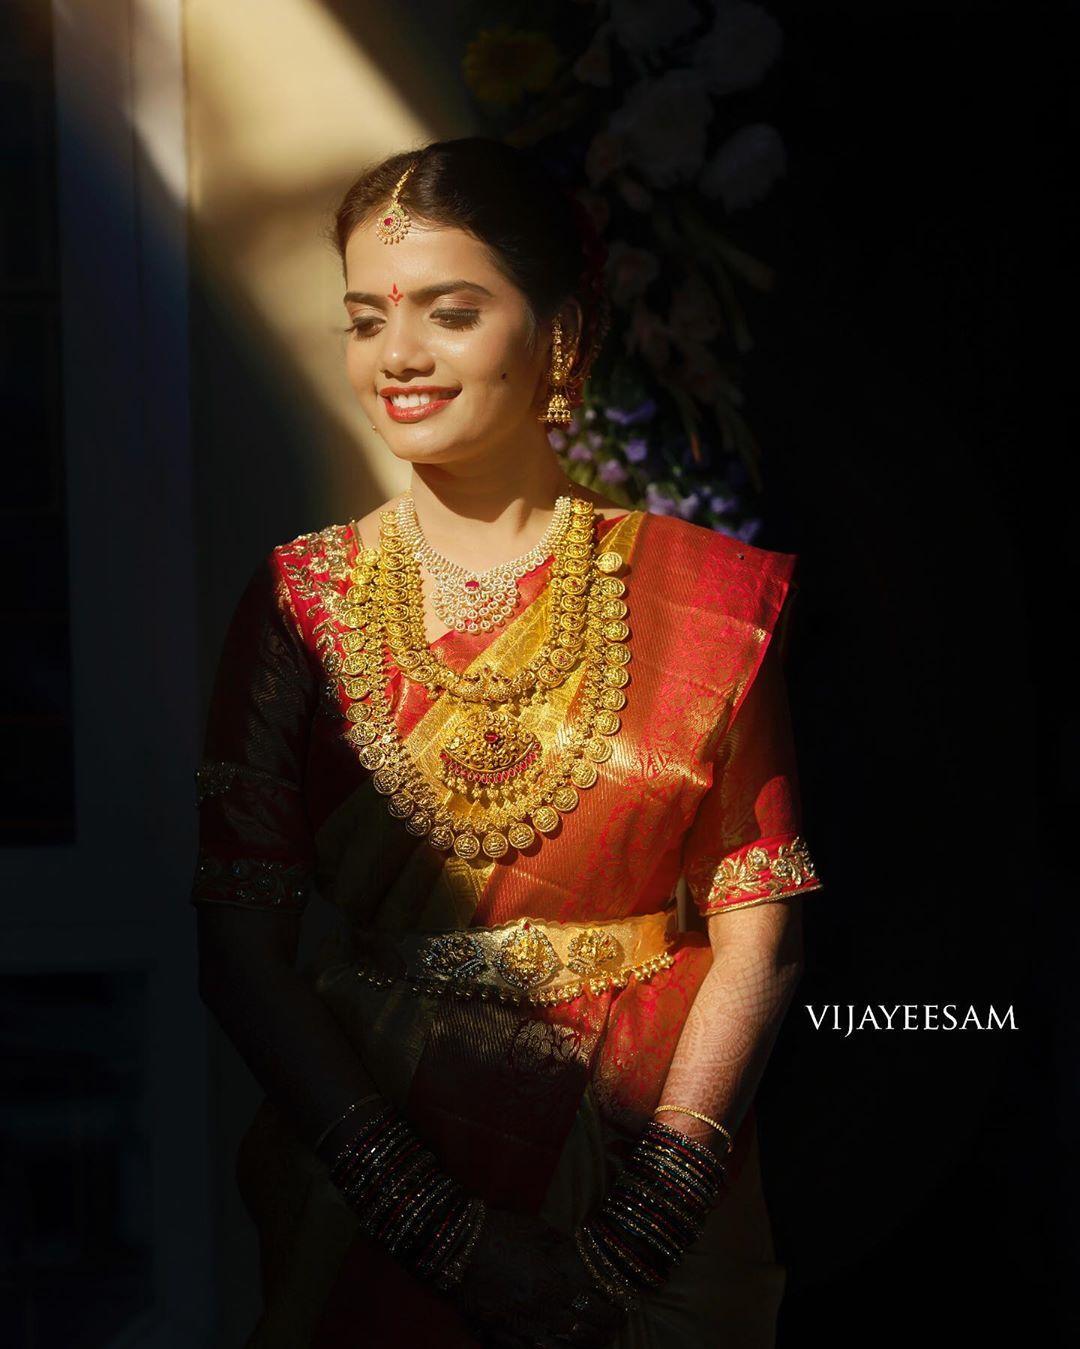 Image may contain 1 person Bridal blouse designs, Bride